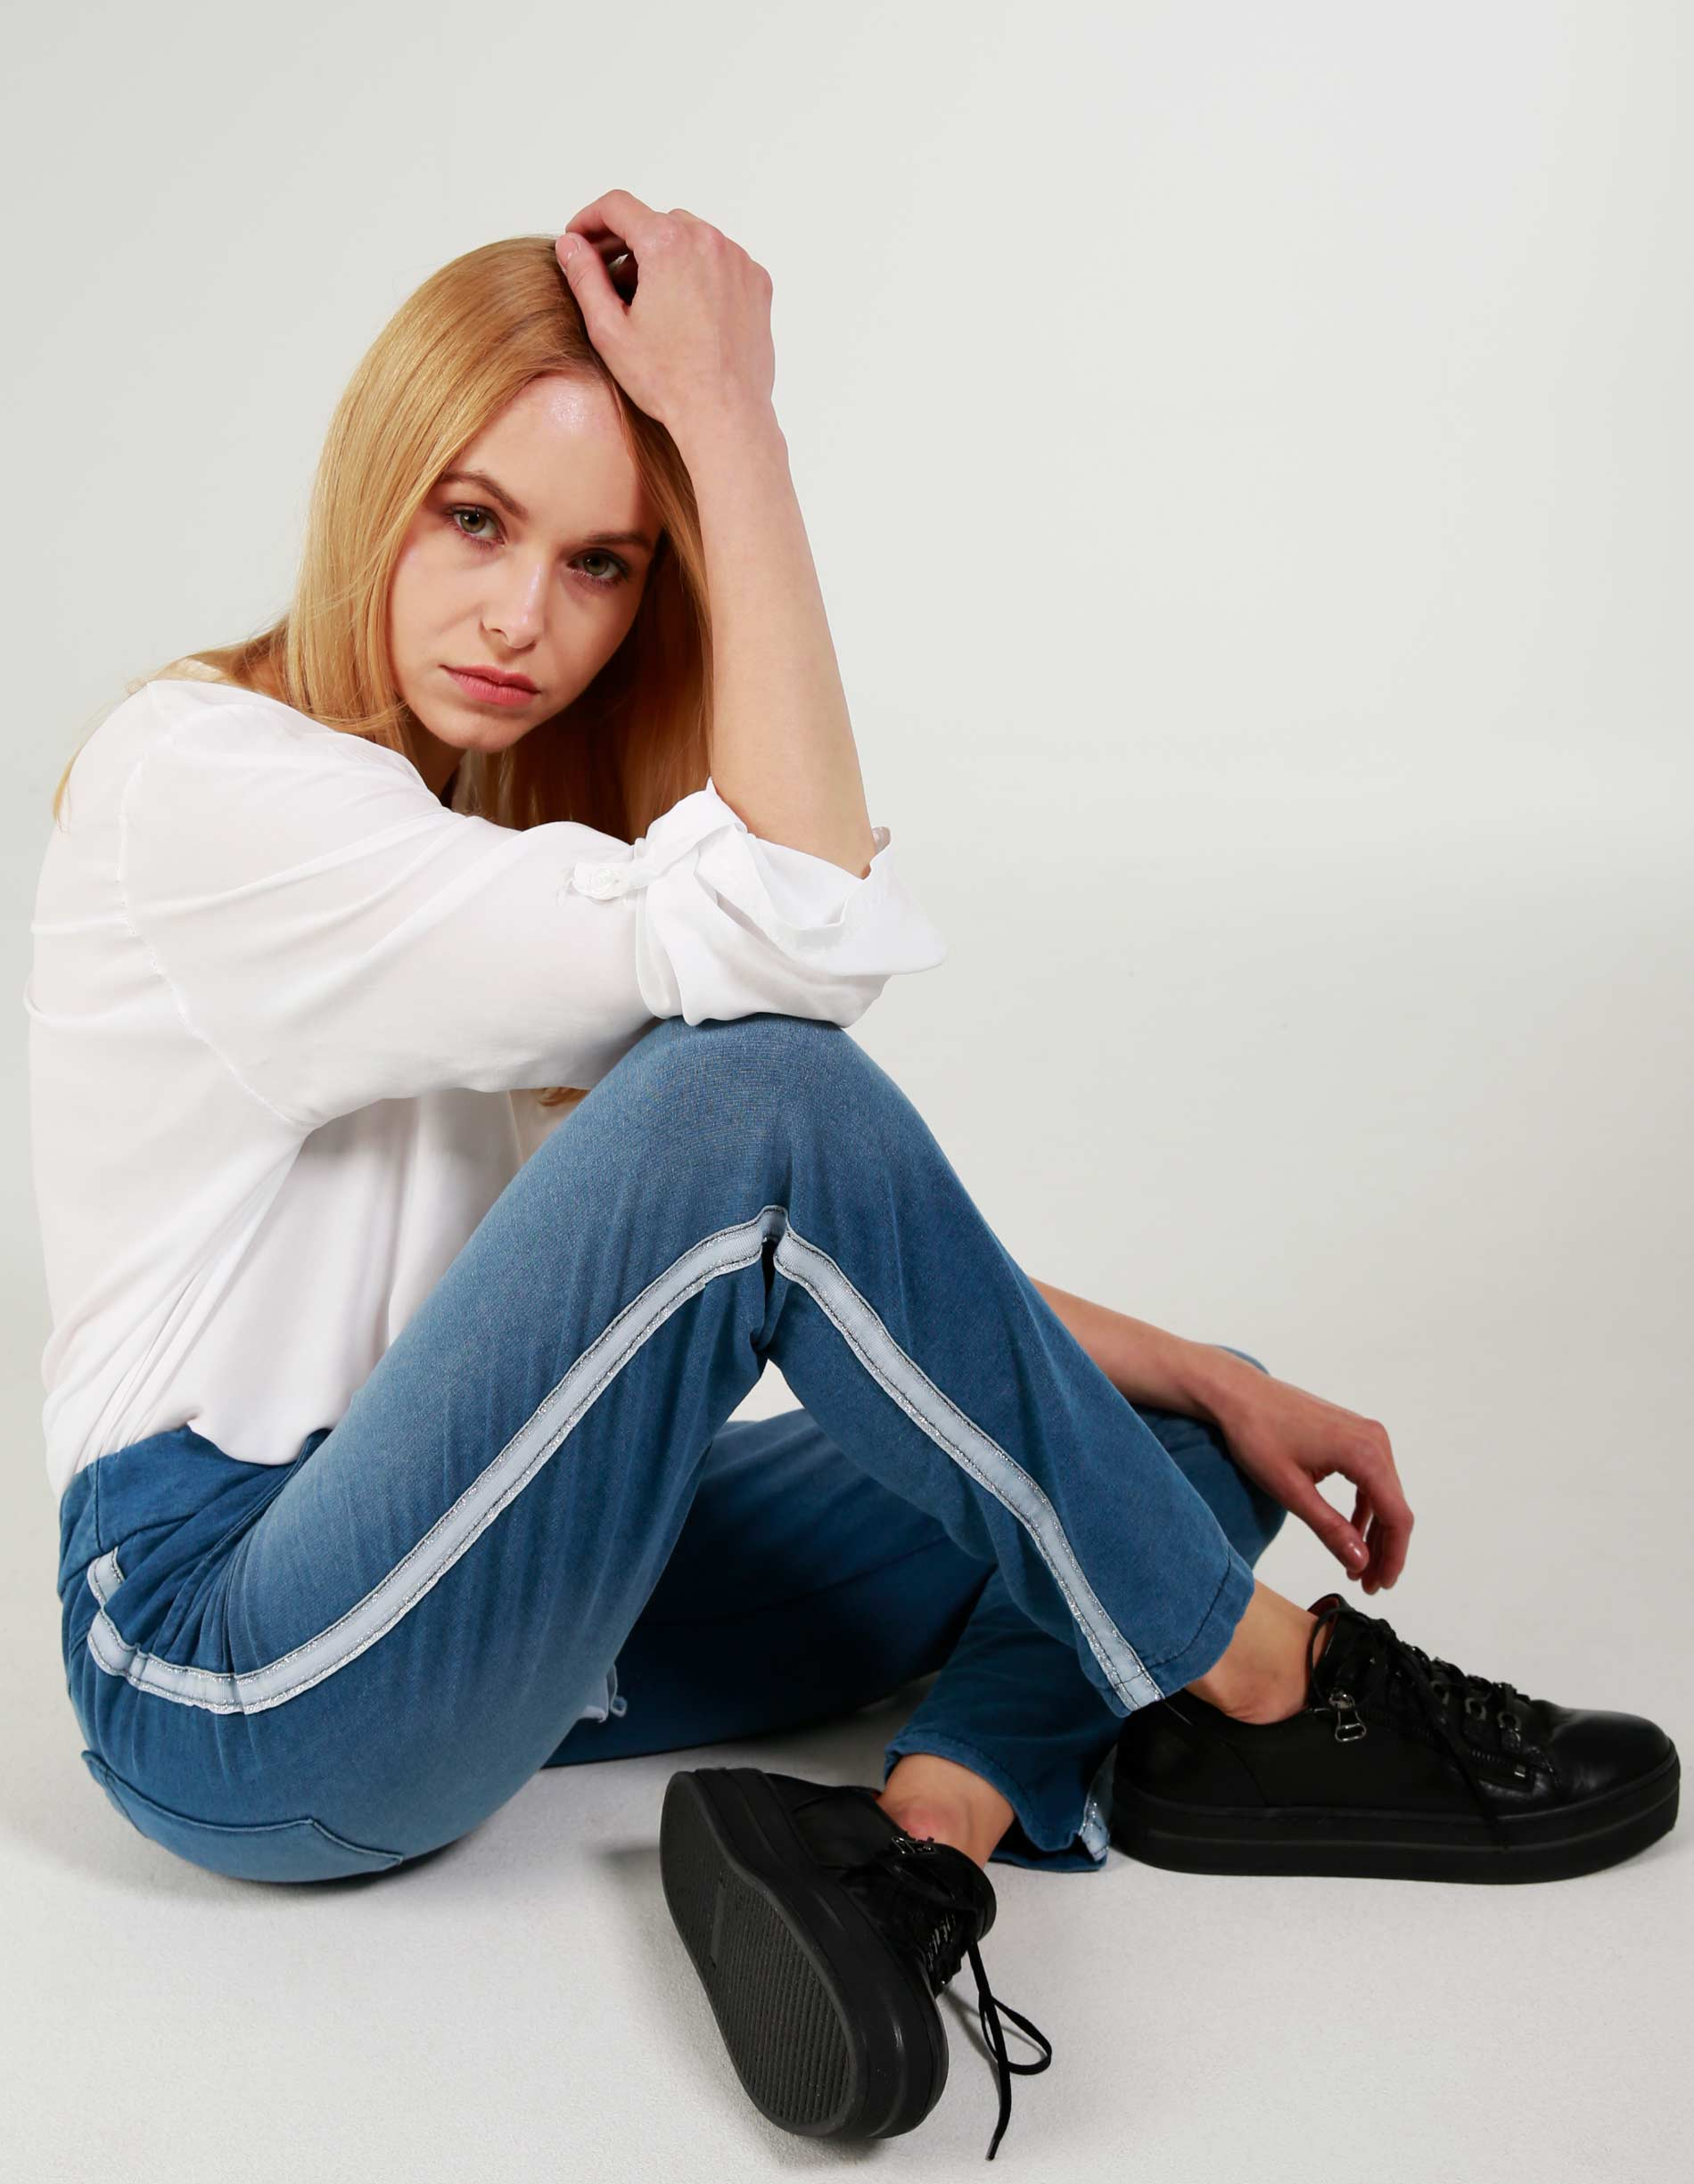 Spodnie - 141-1256B JEA - Unisono